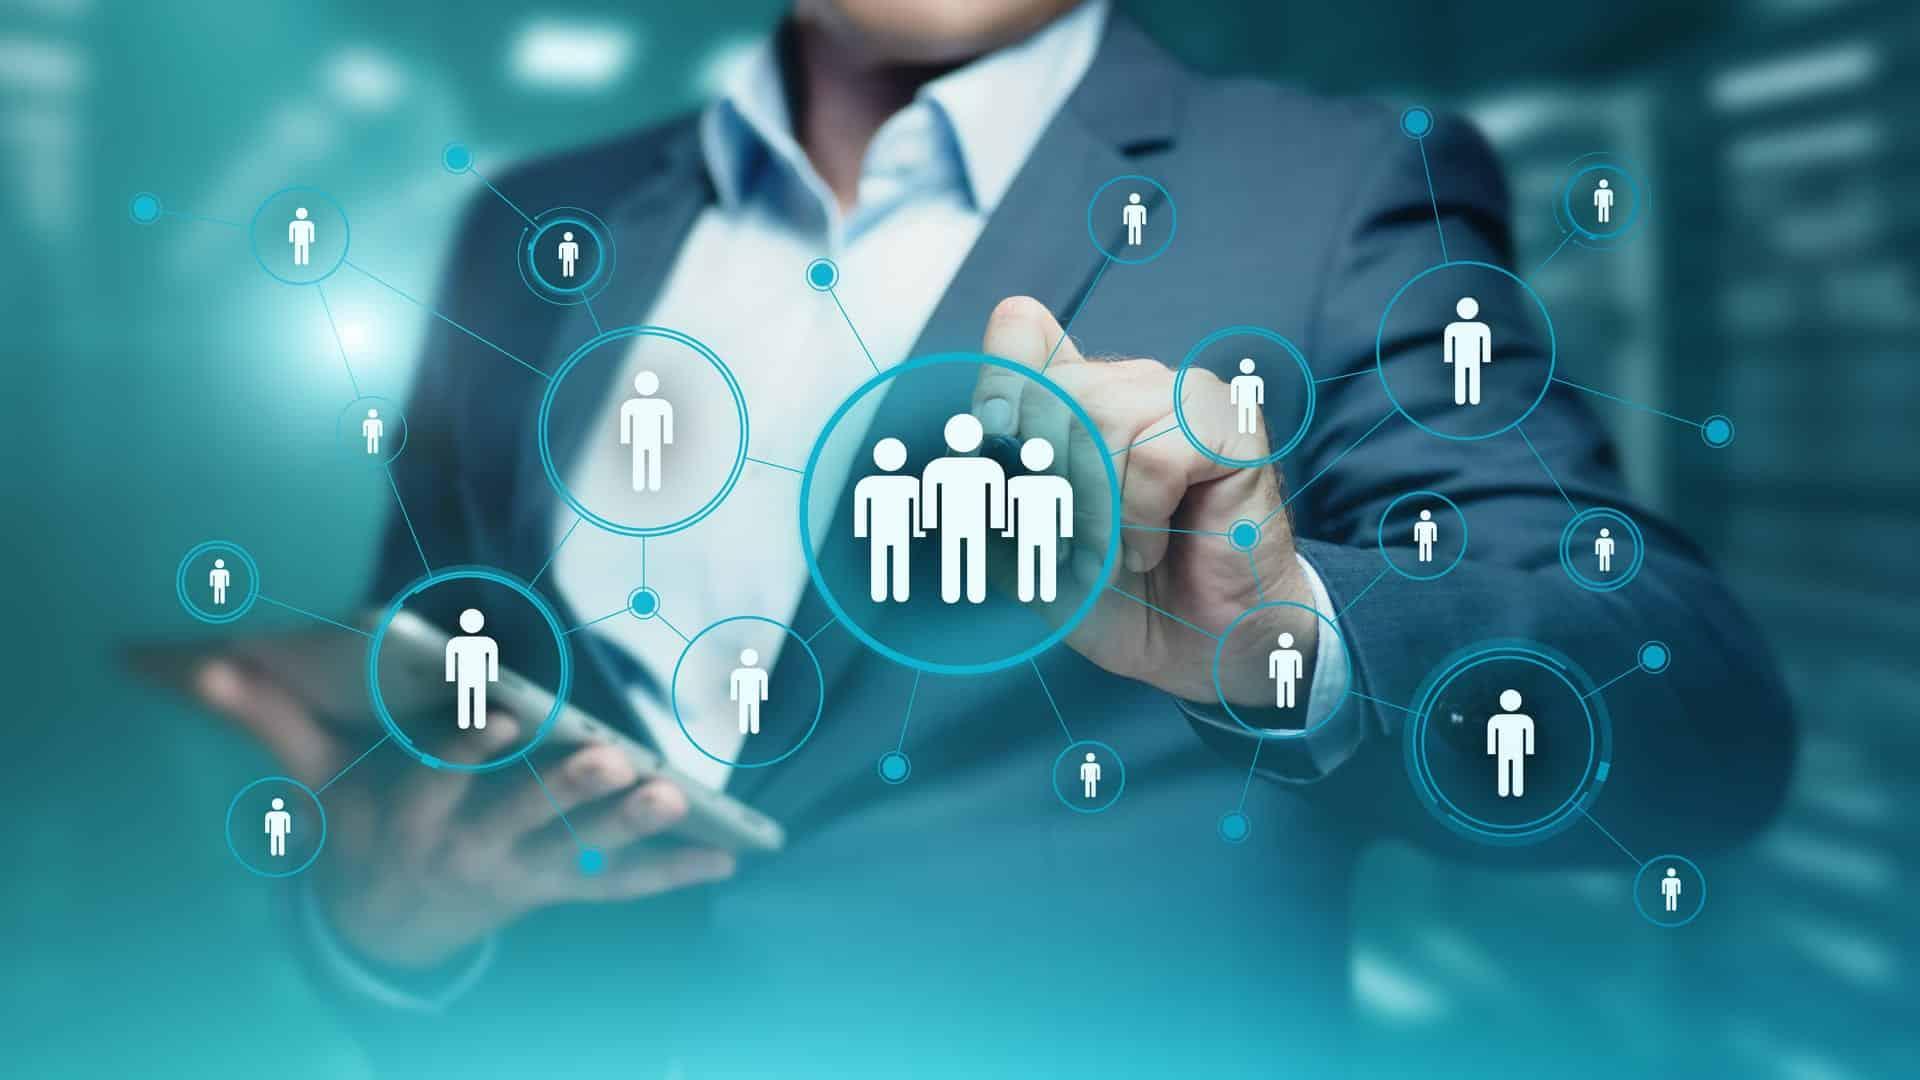 DAOStack: Building A Framework For Decentralized Organizational Structures